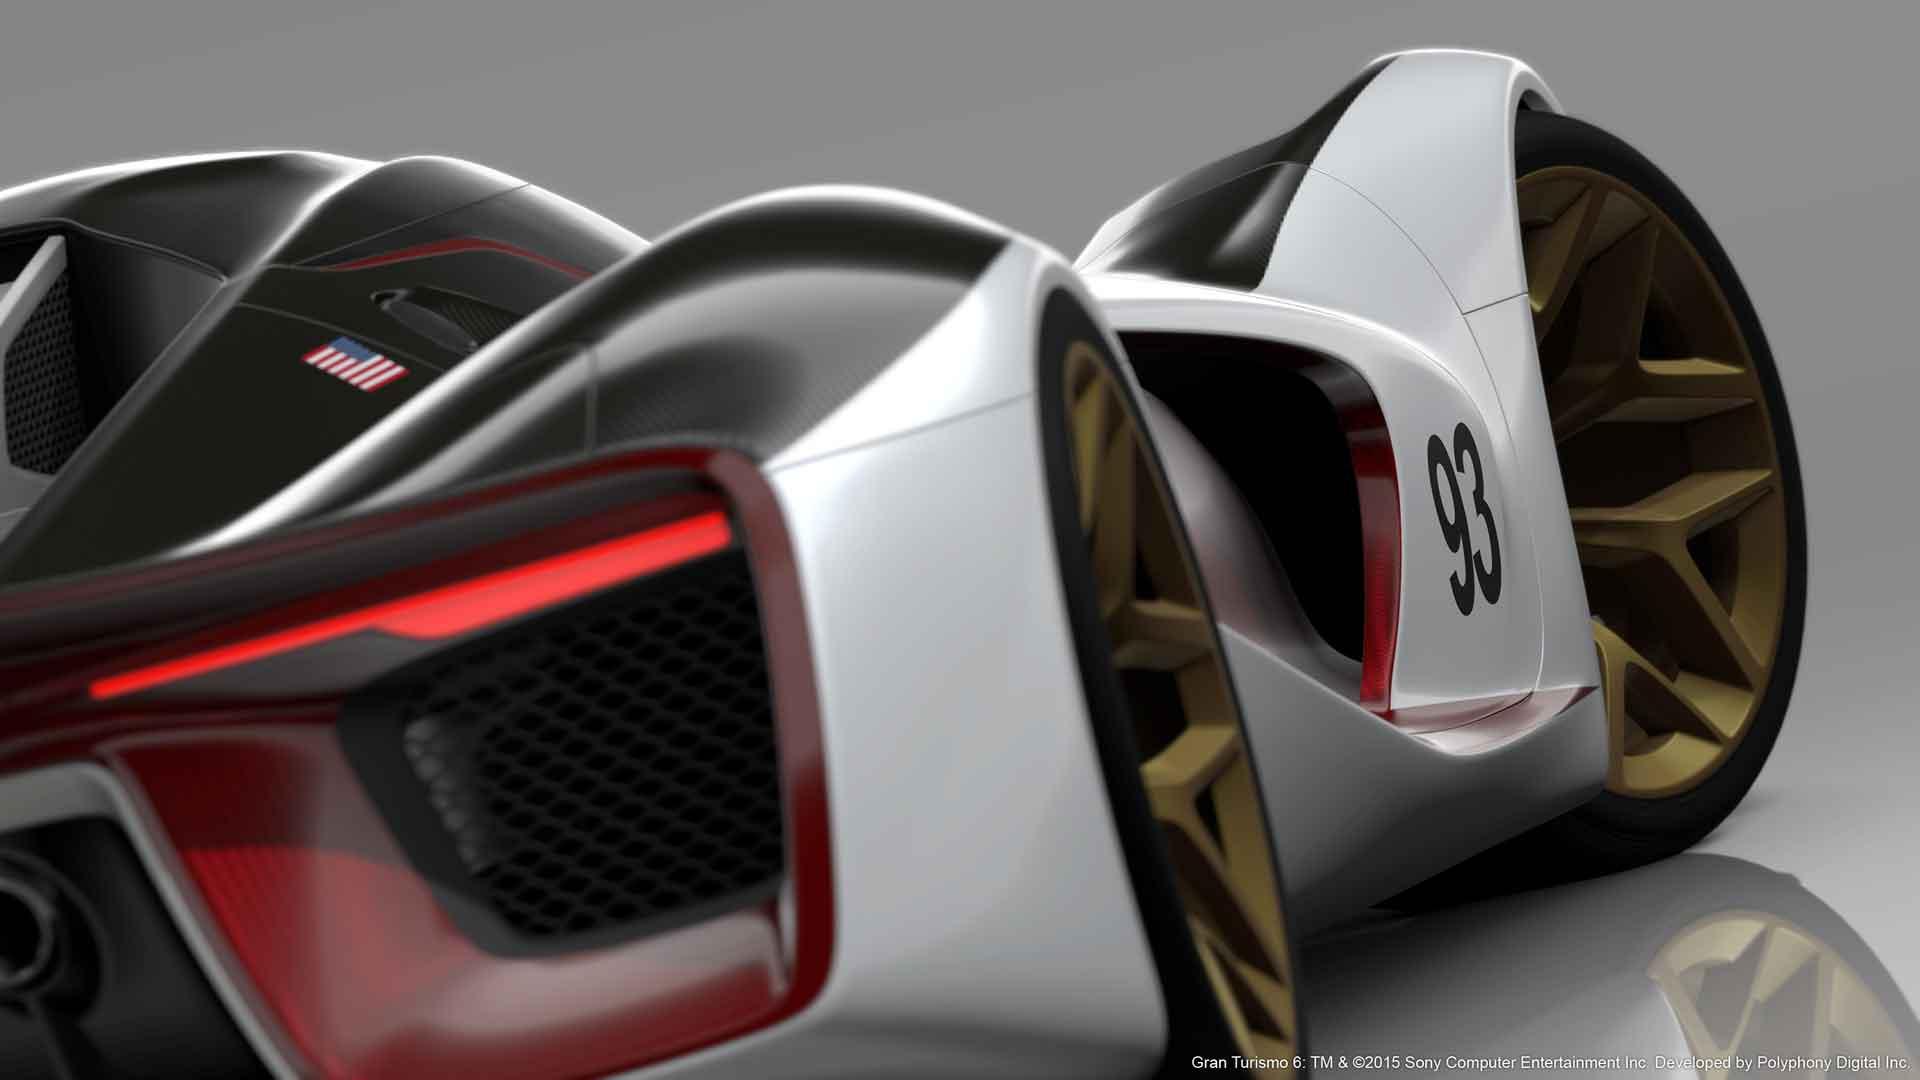 SRT Tomahawk Supercar for Gran Turismo 6